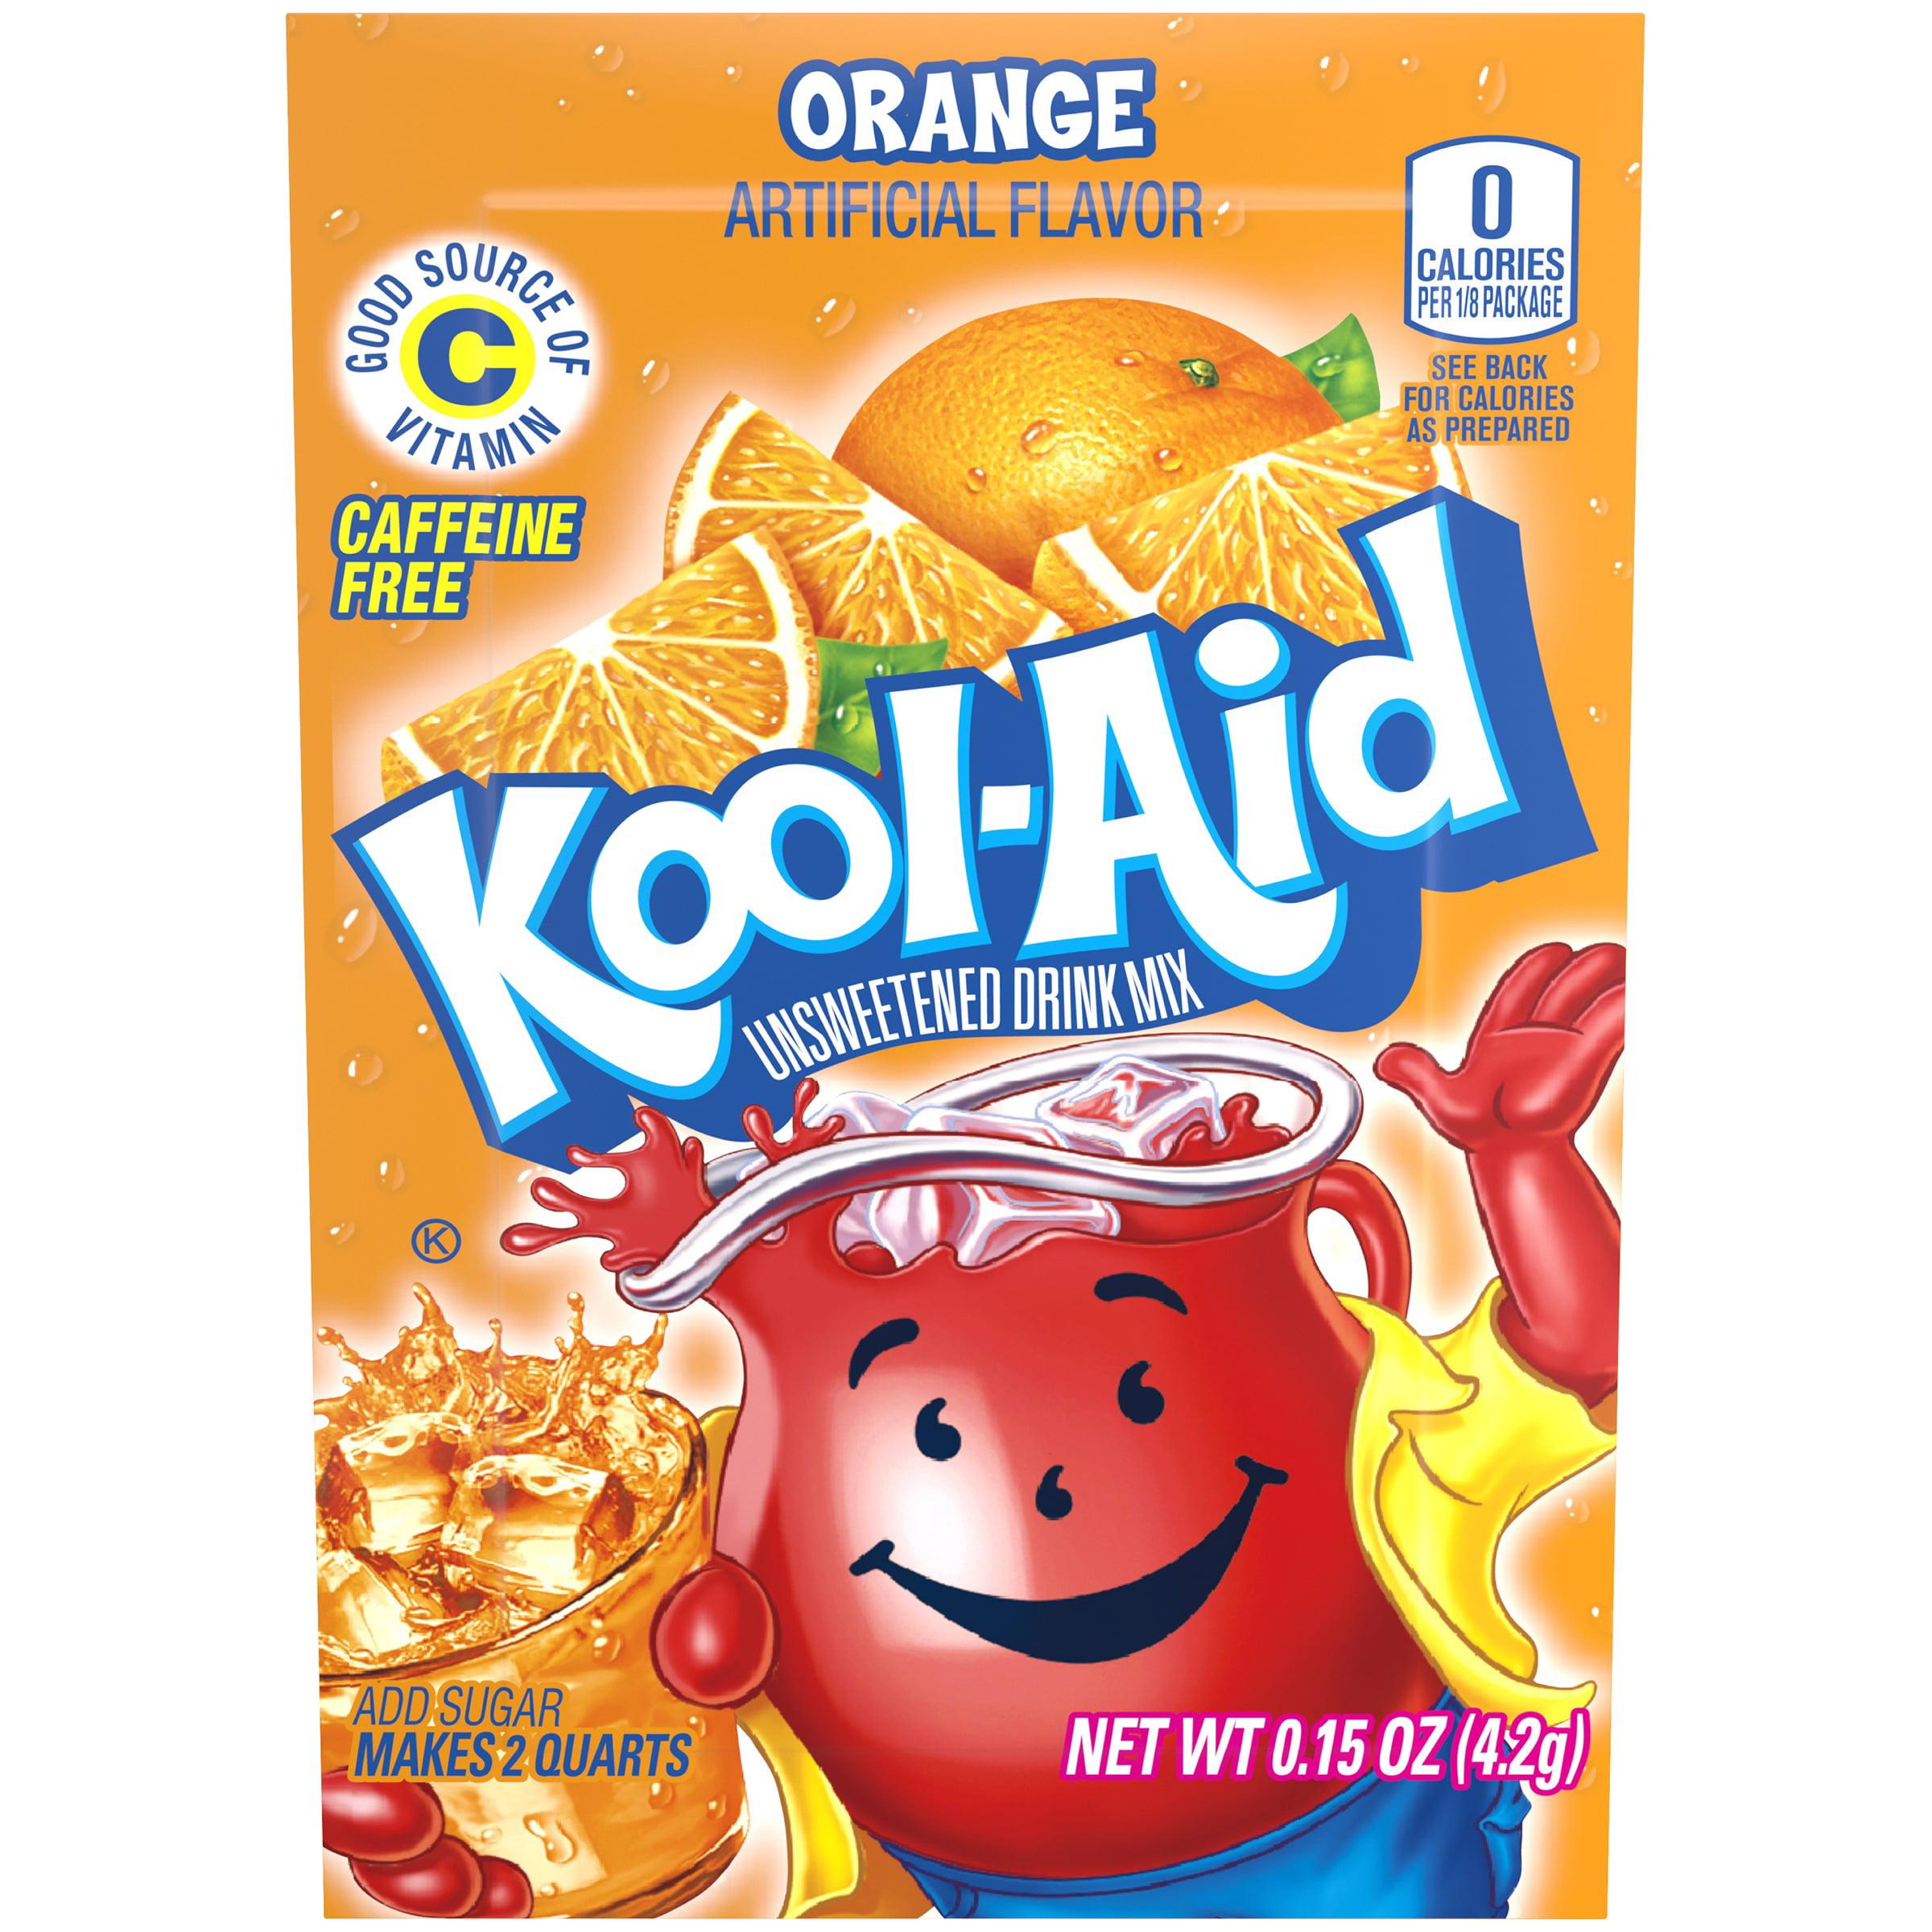 (3 Pack) Kool-Aid Orange Unsweetened Drink Mix, 0.14 oz Envelope